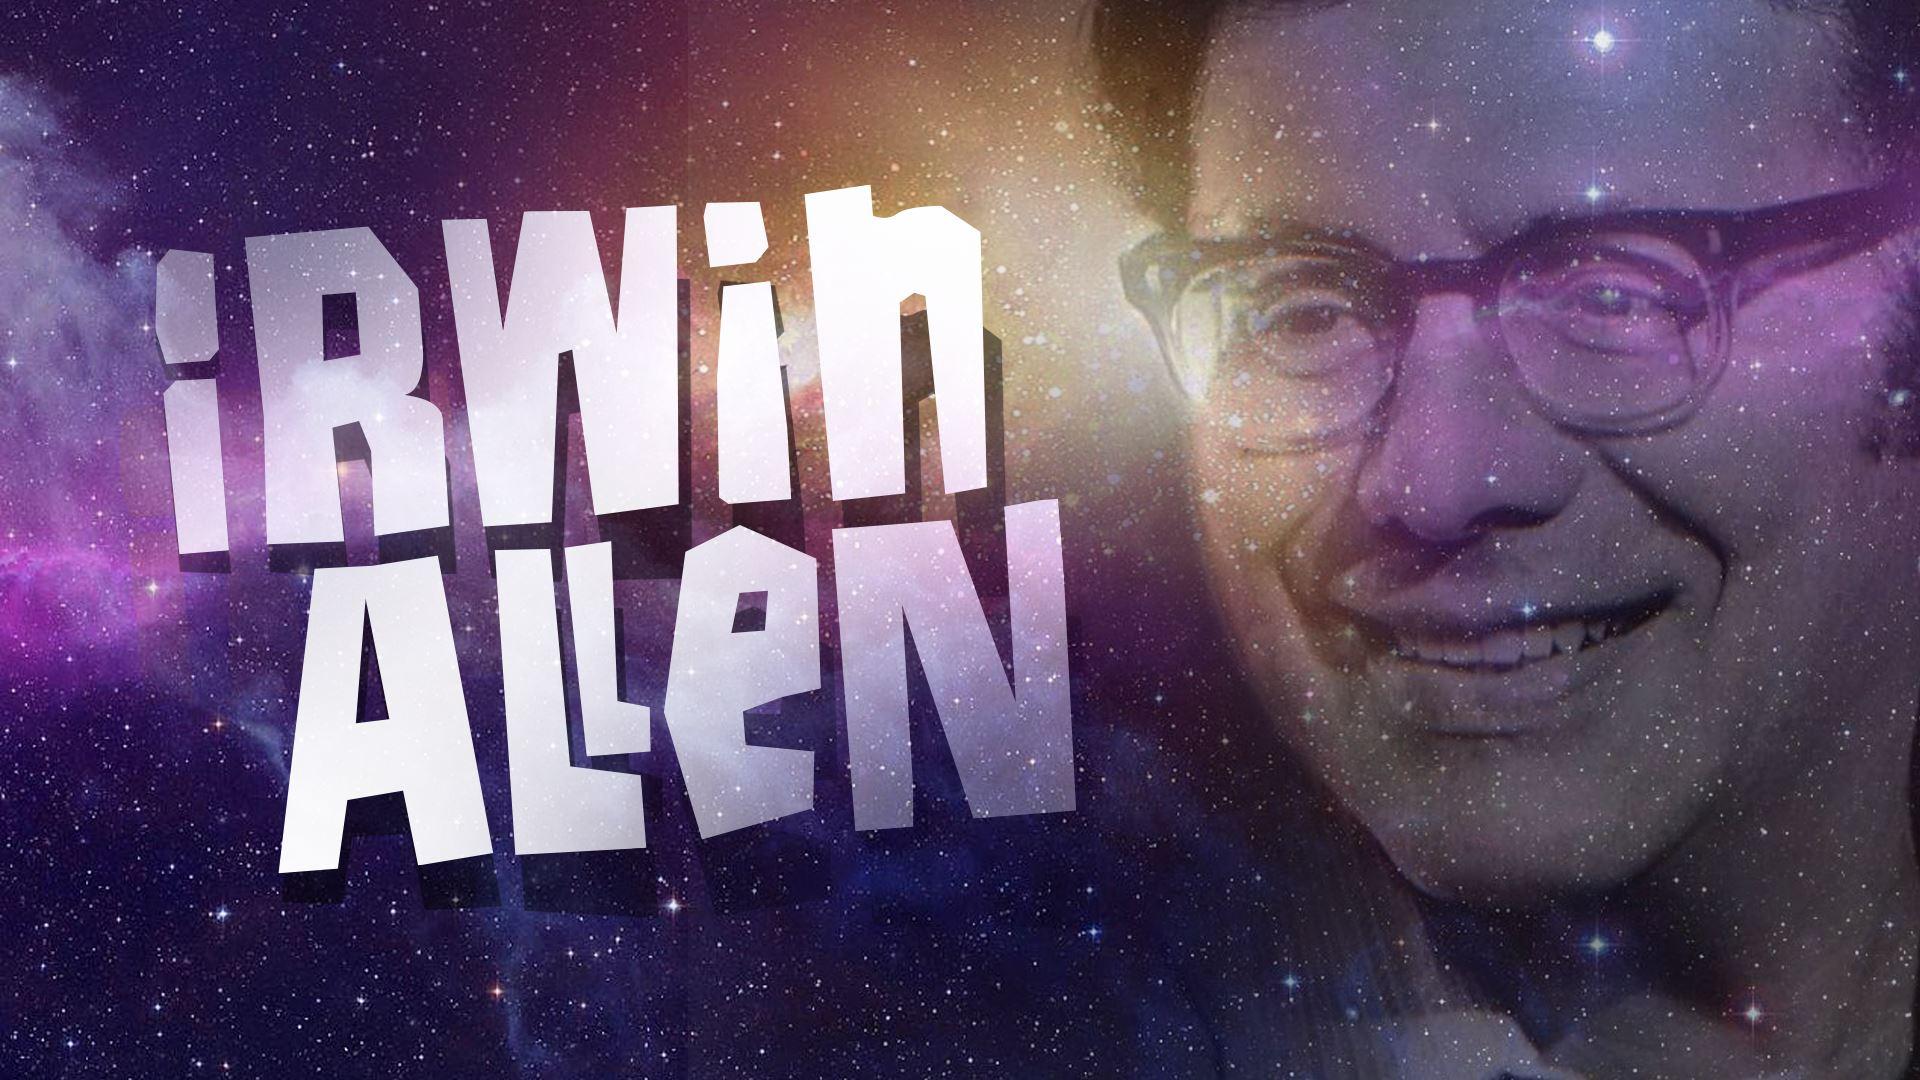 Download Irwin Allen cool free fonts